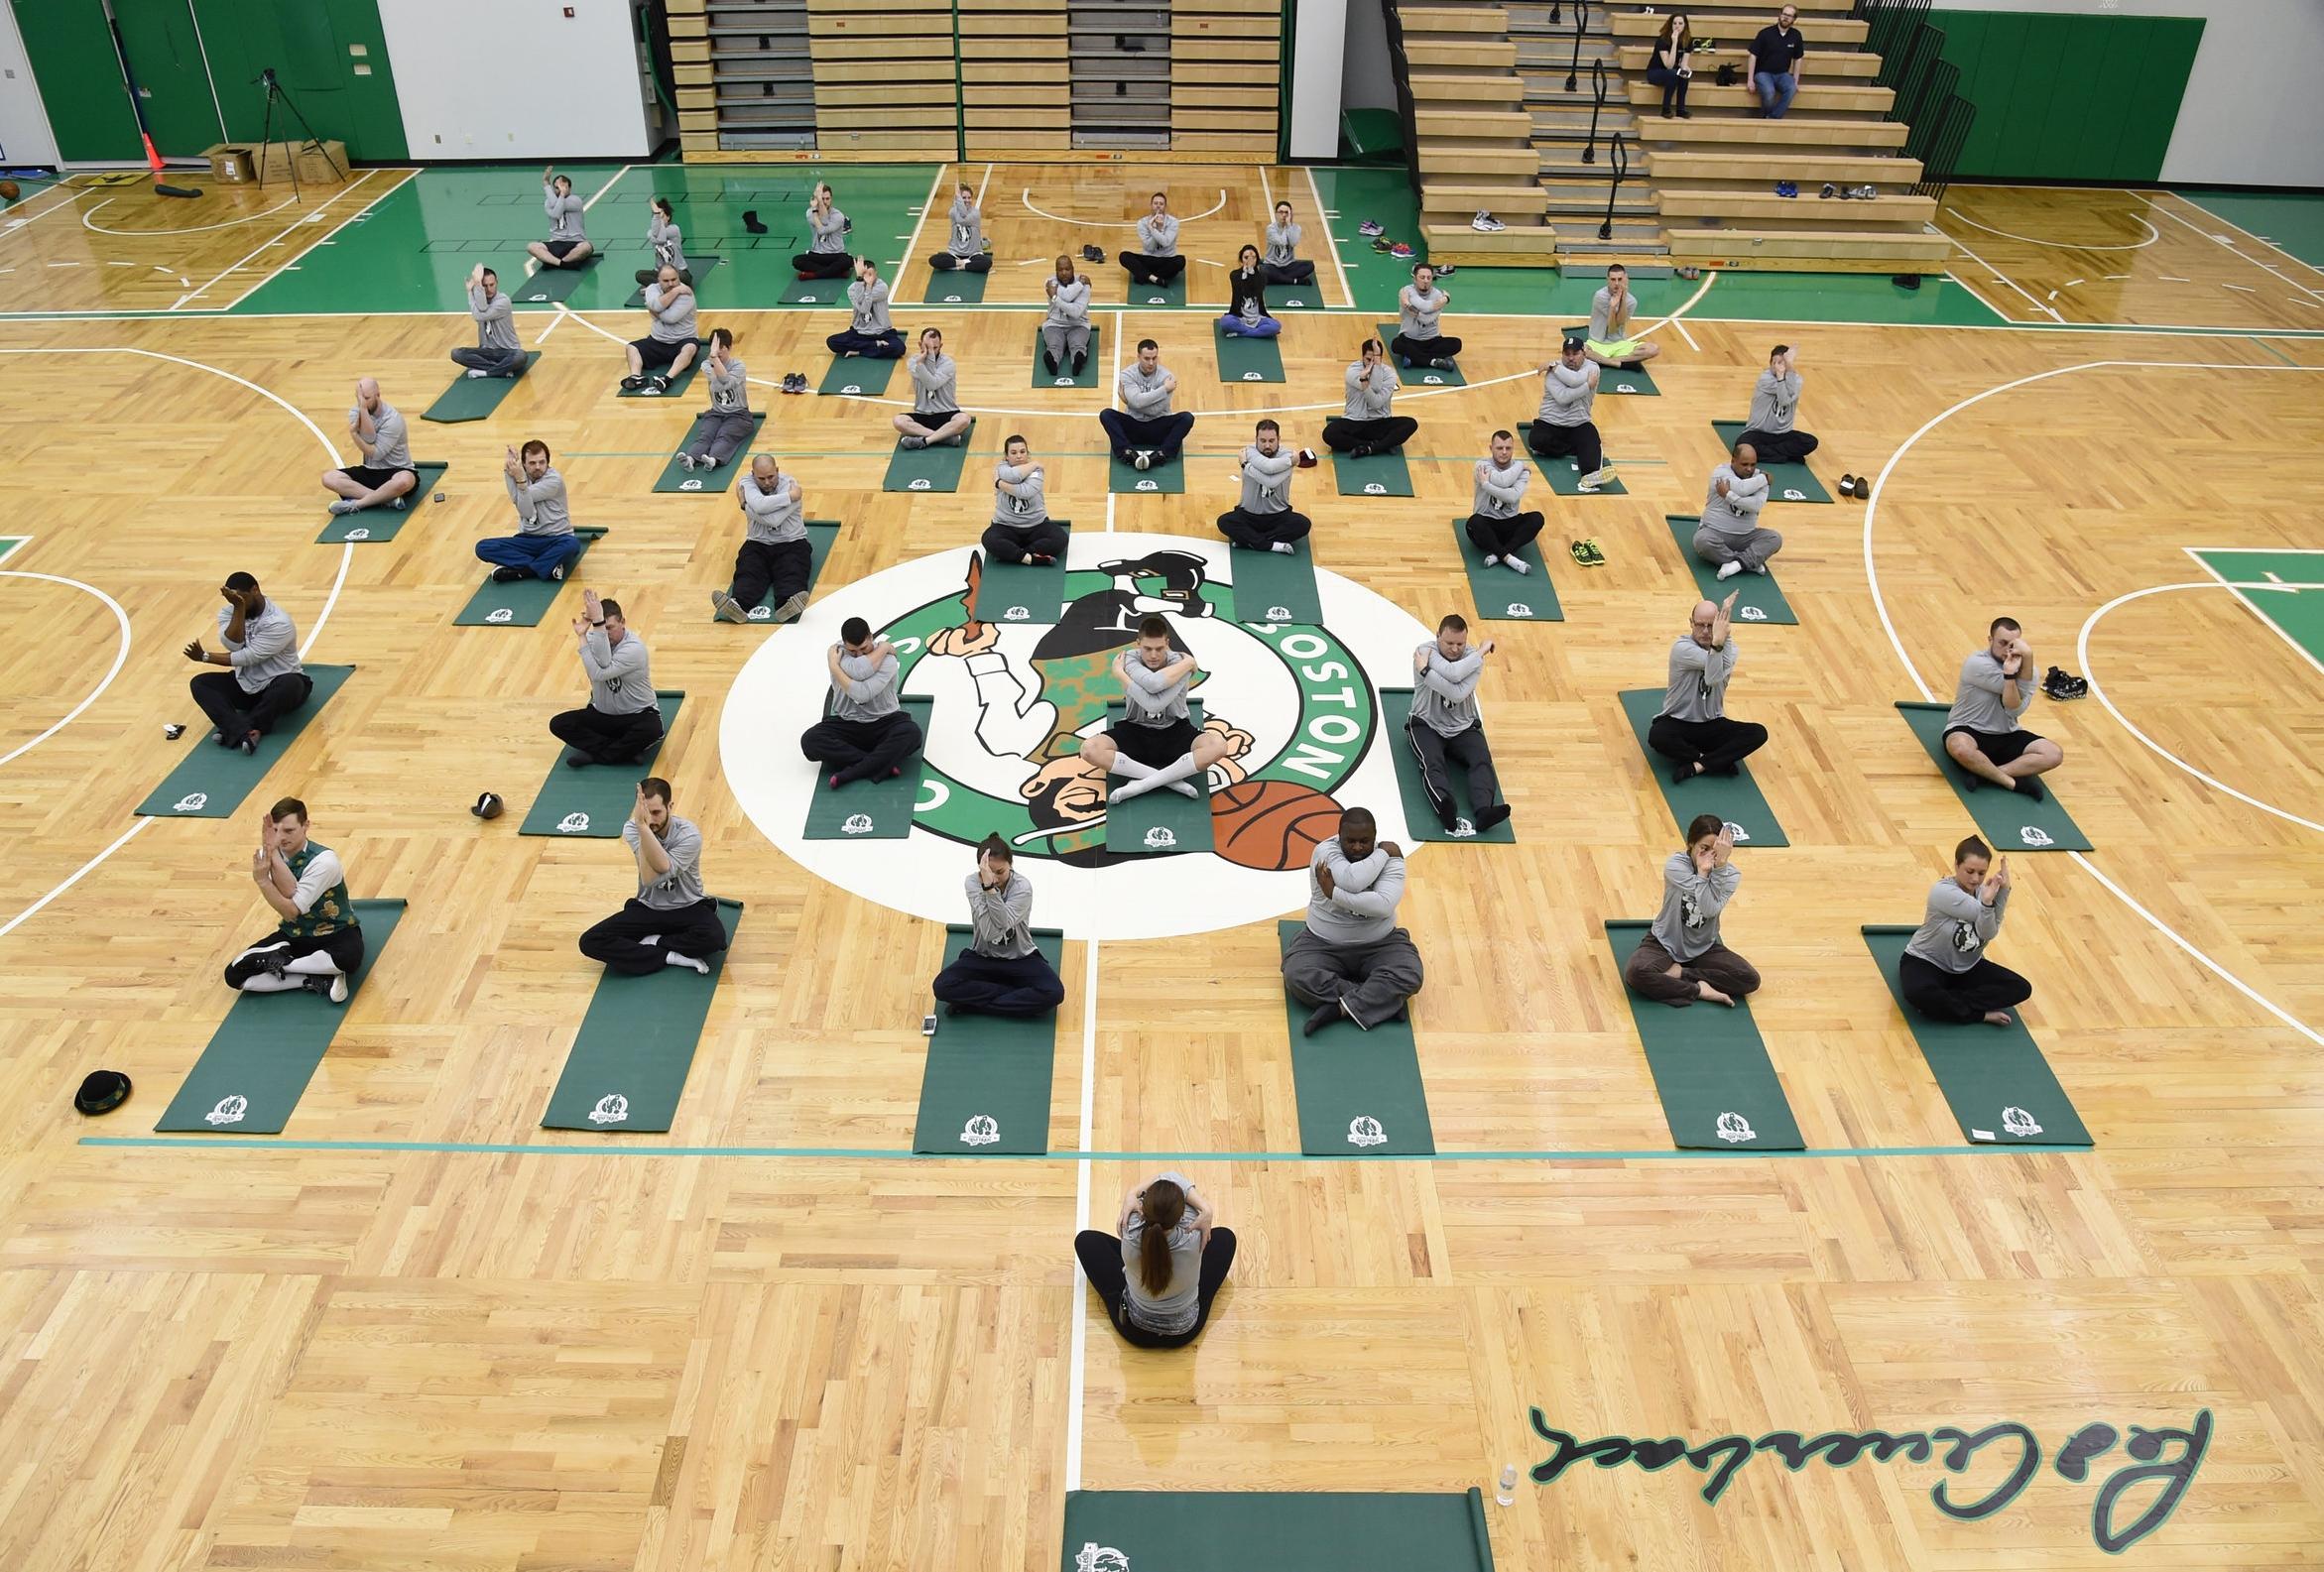 Ali teaching a class for the Boston Celtics' SNHU program on the team's practice court.